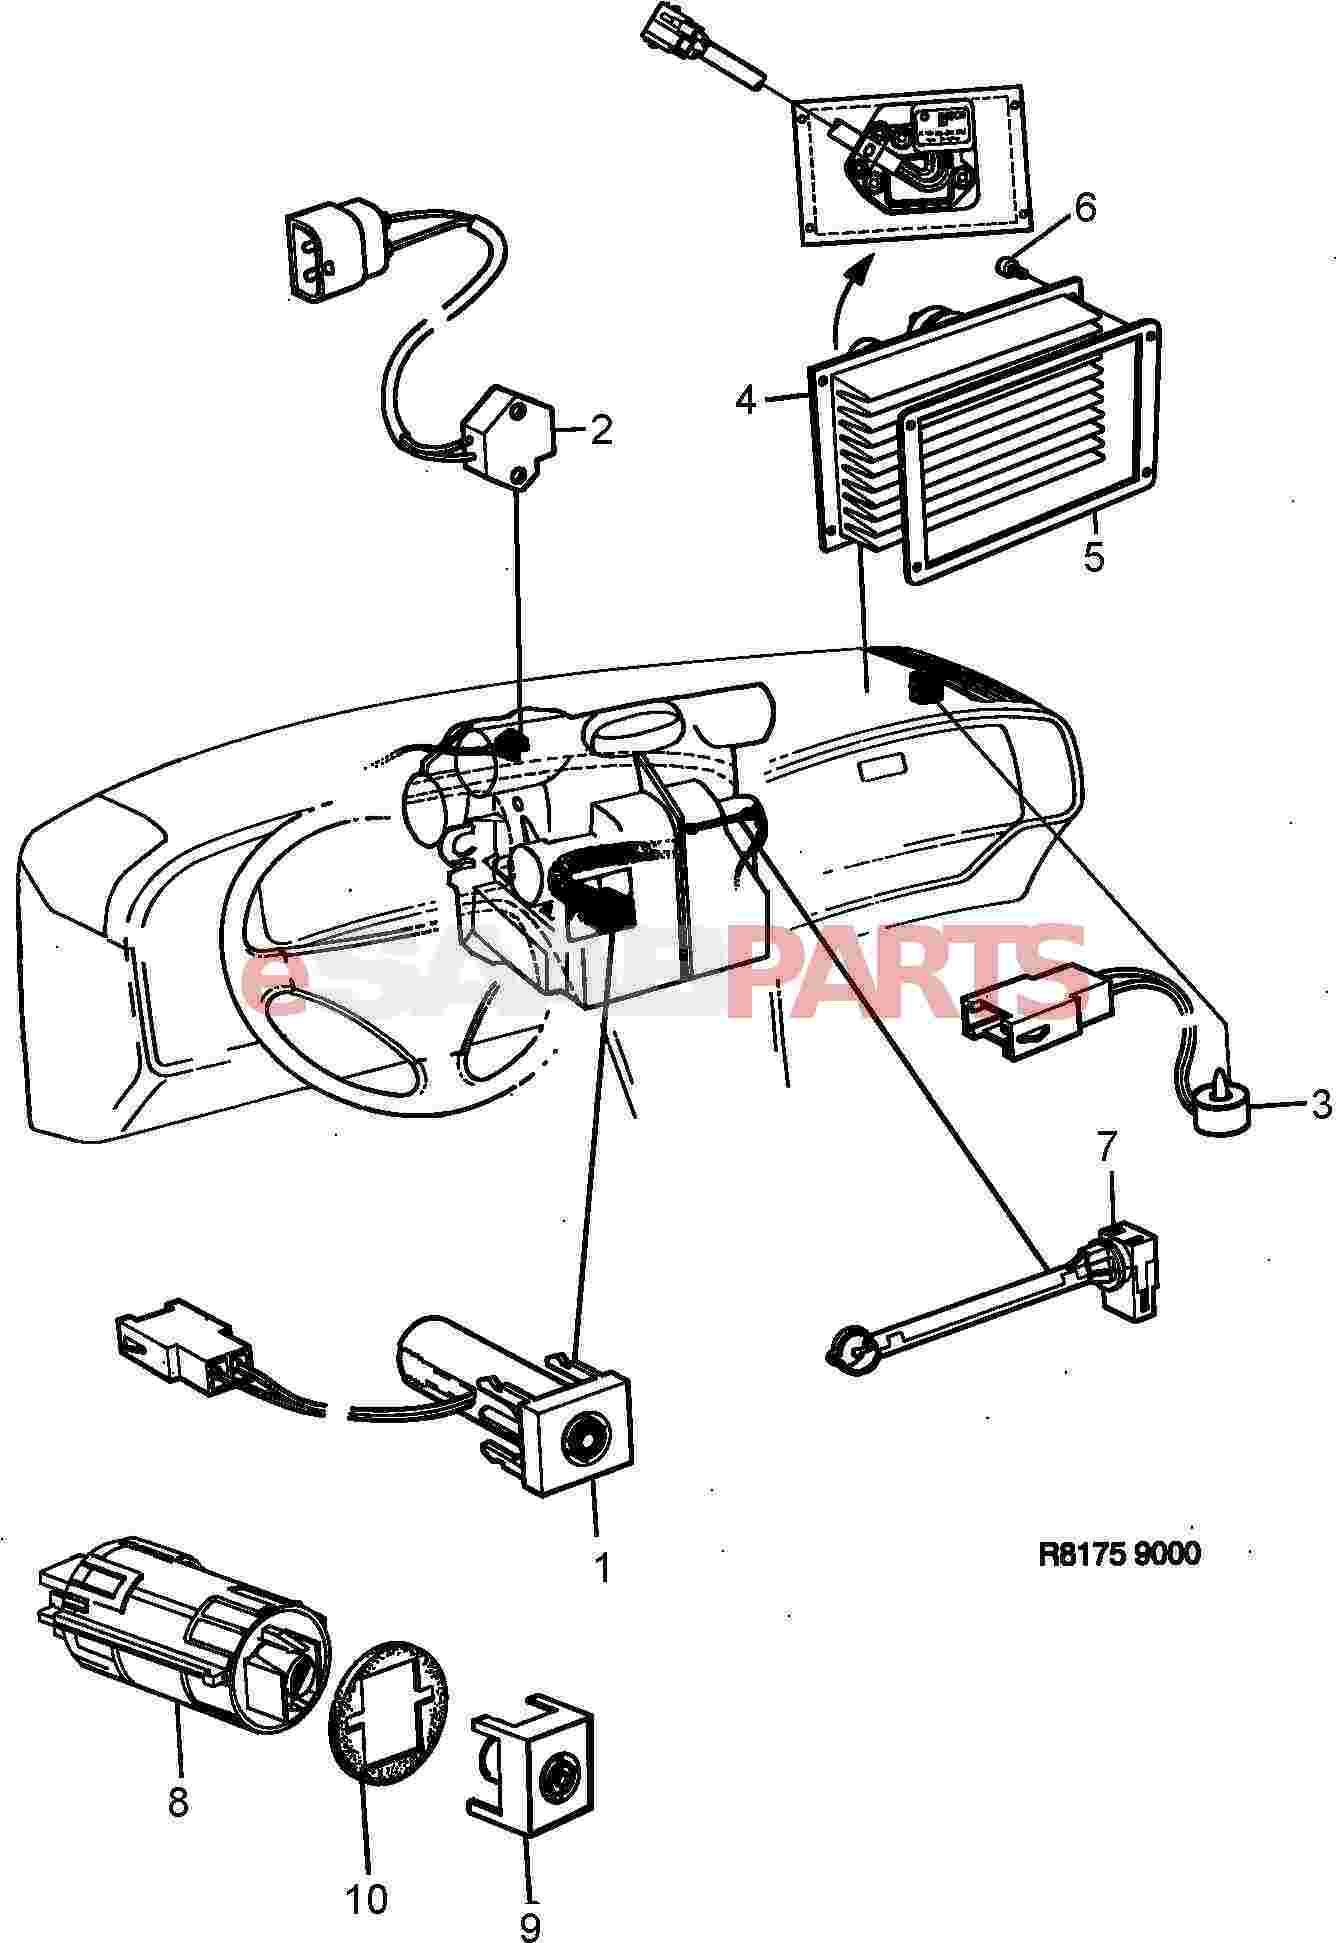 Saab 900 Convertible Wiring Diagram